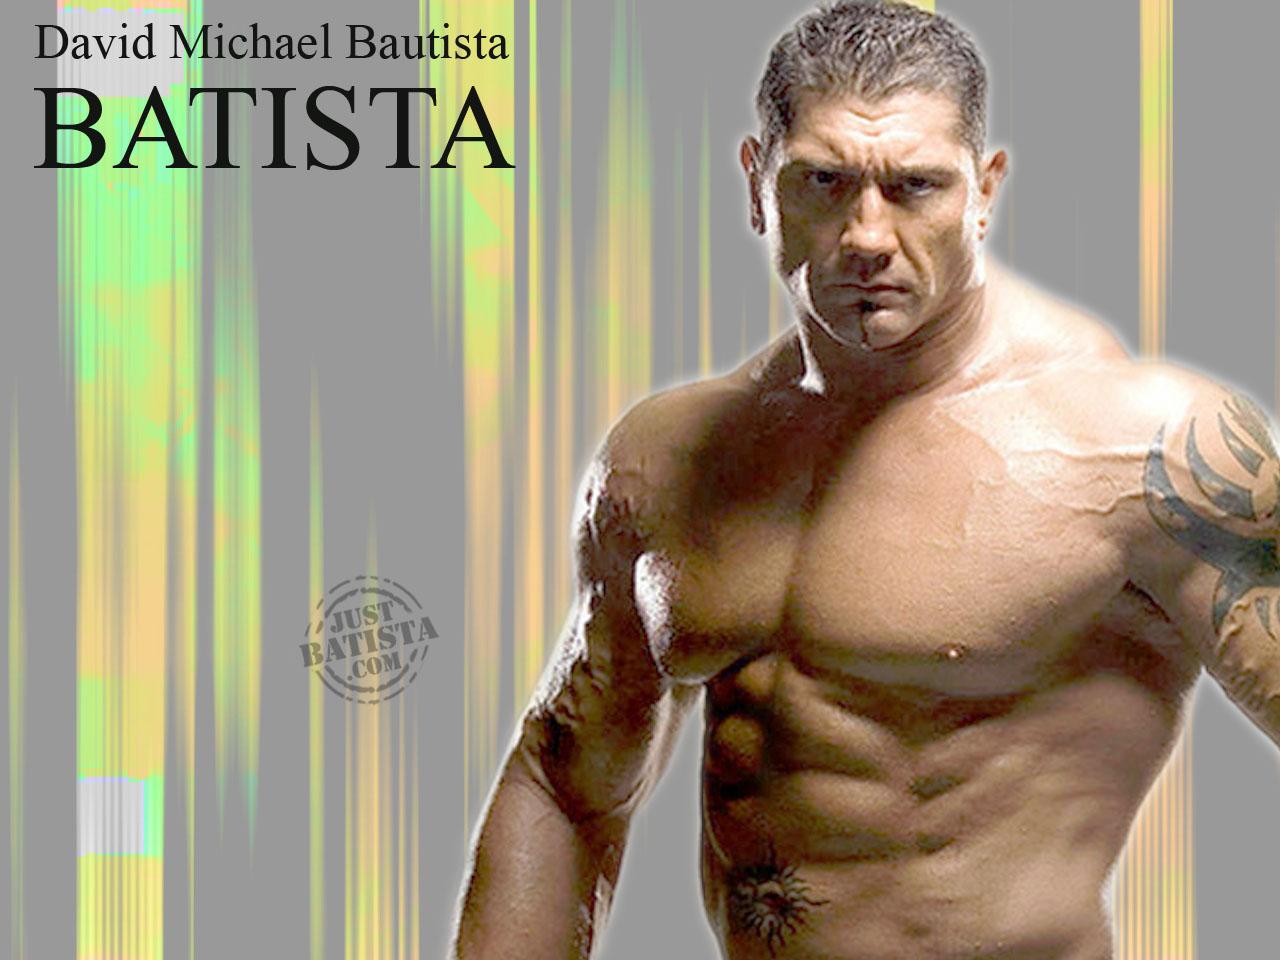 http://2.bp.blogspot.com/-TLF8RMVr5zo/TjhqtAI_mXI/AAAAAAAAAk4/zlwS6Z8bZWw/s1600/Batista-Wallpaper-9.jpg